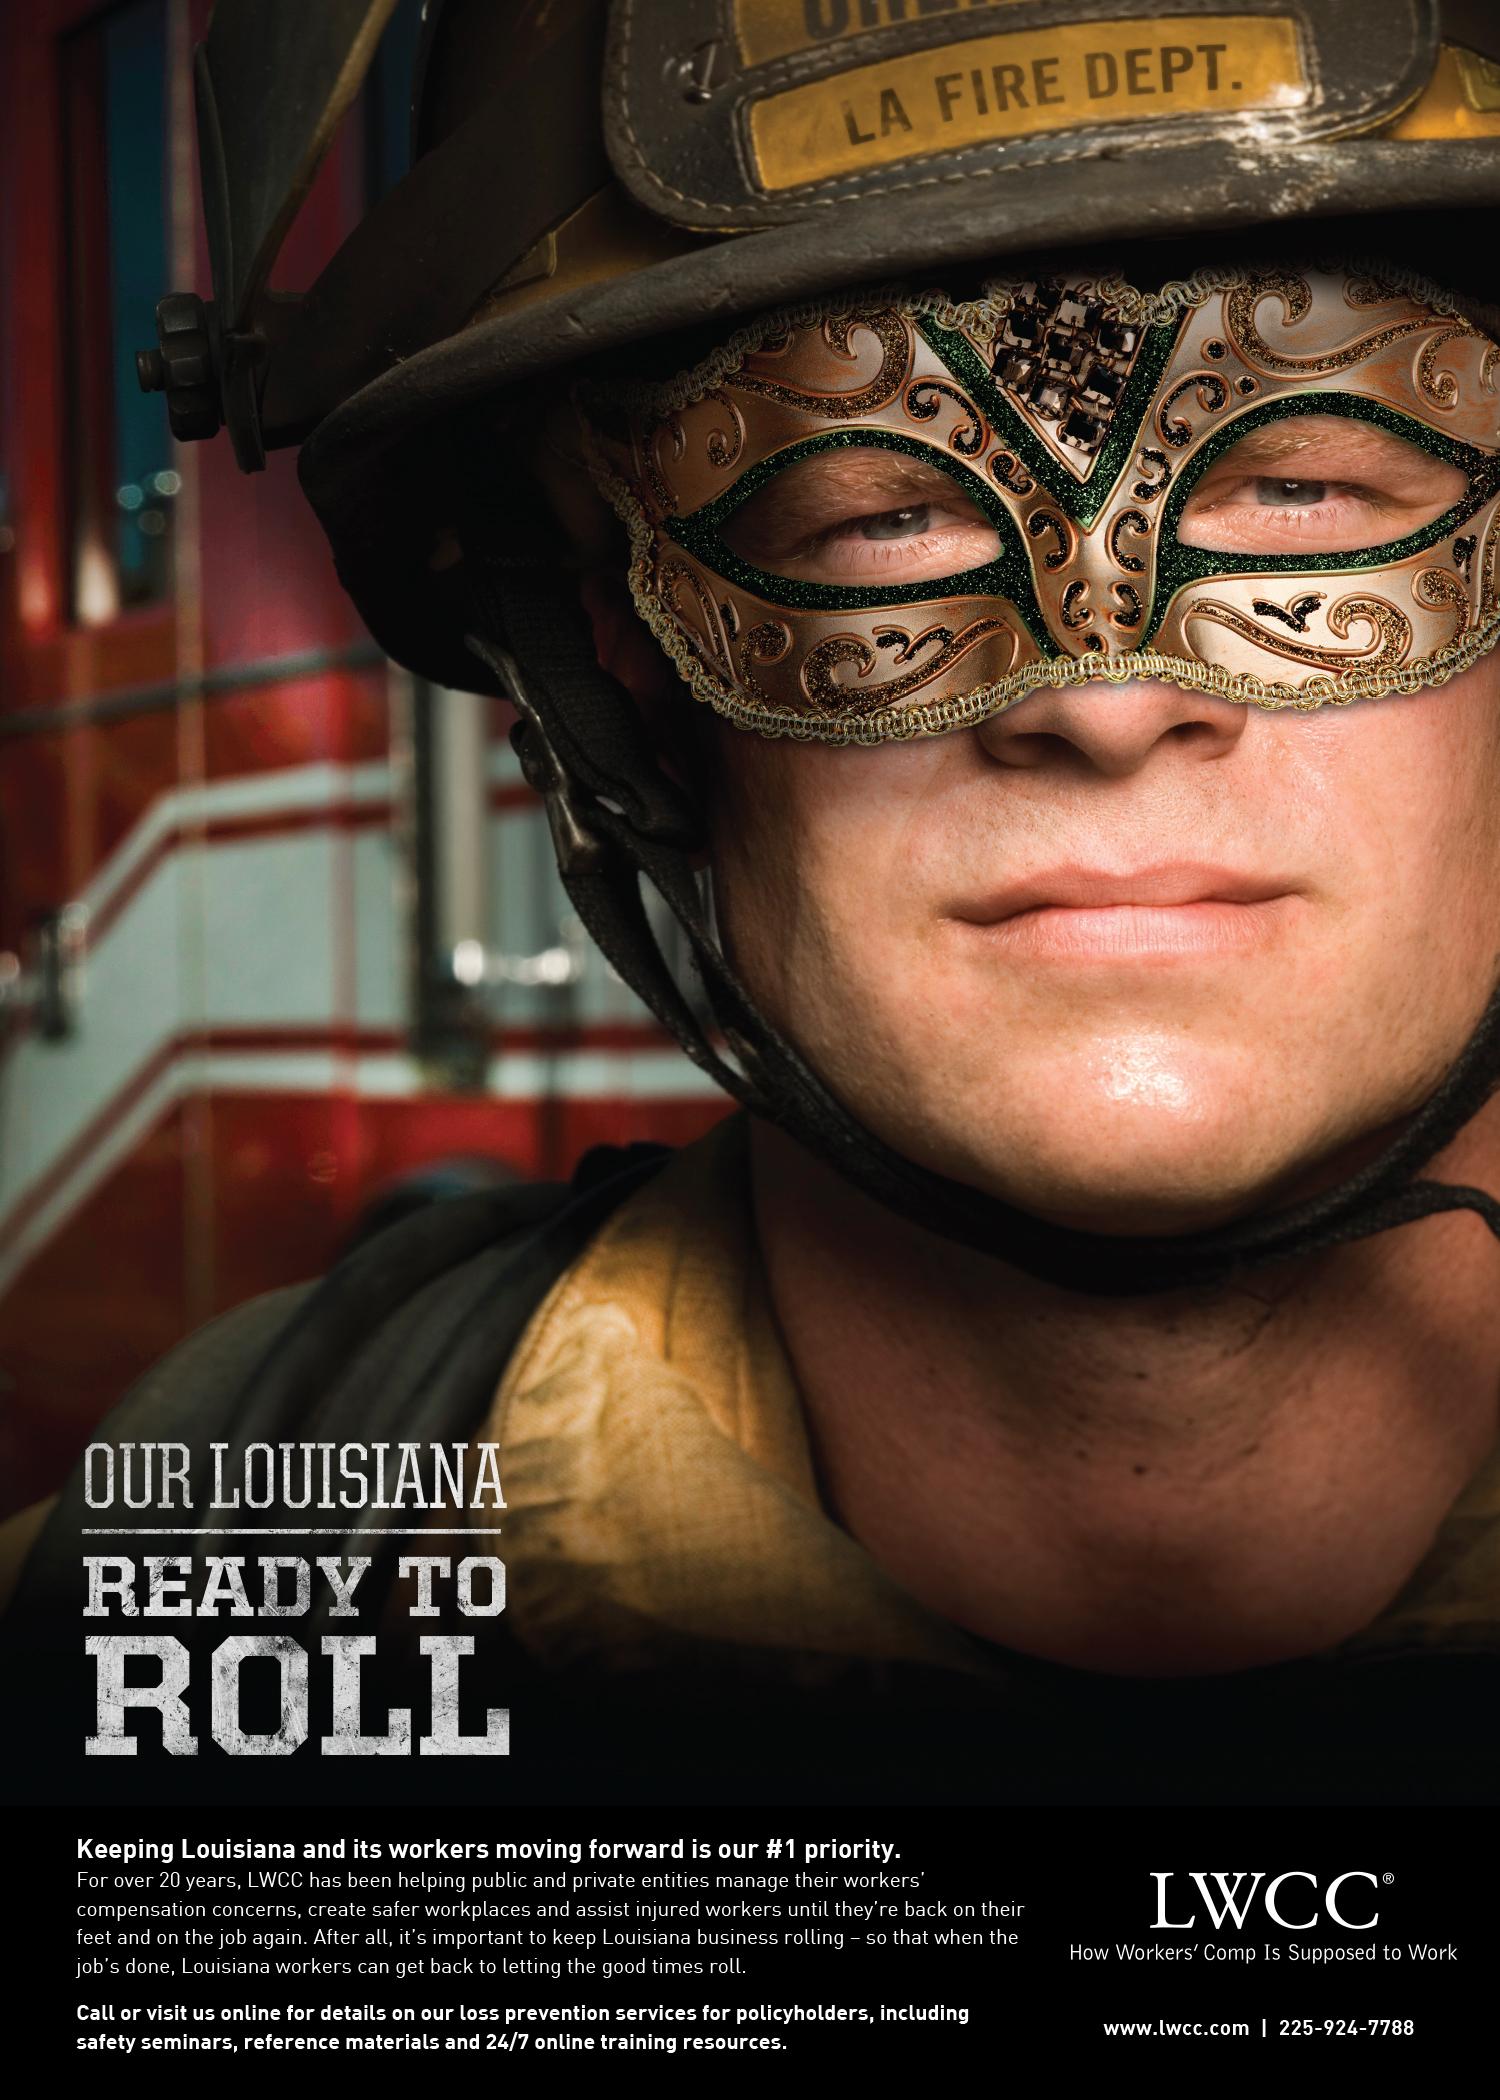 LWCC: 2014 Print Ad — Fireman